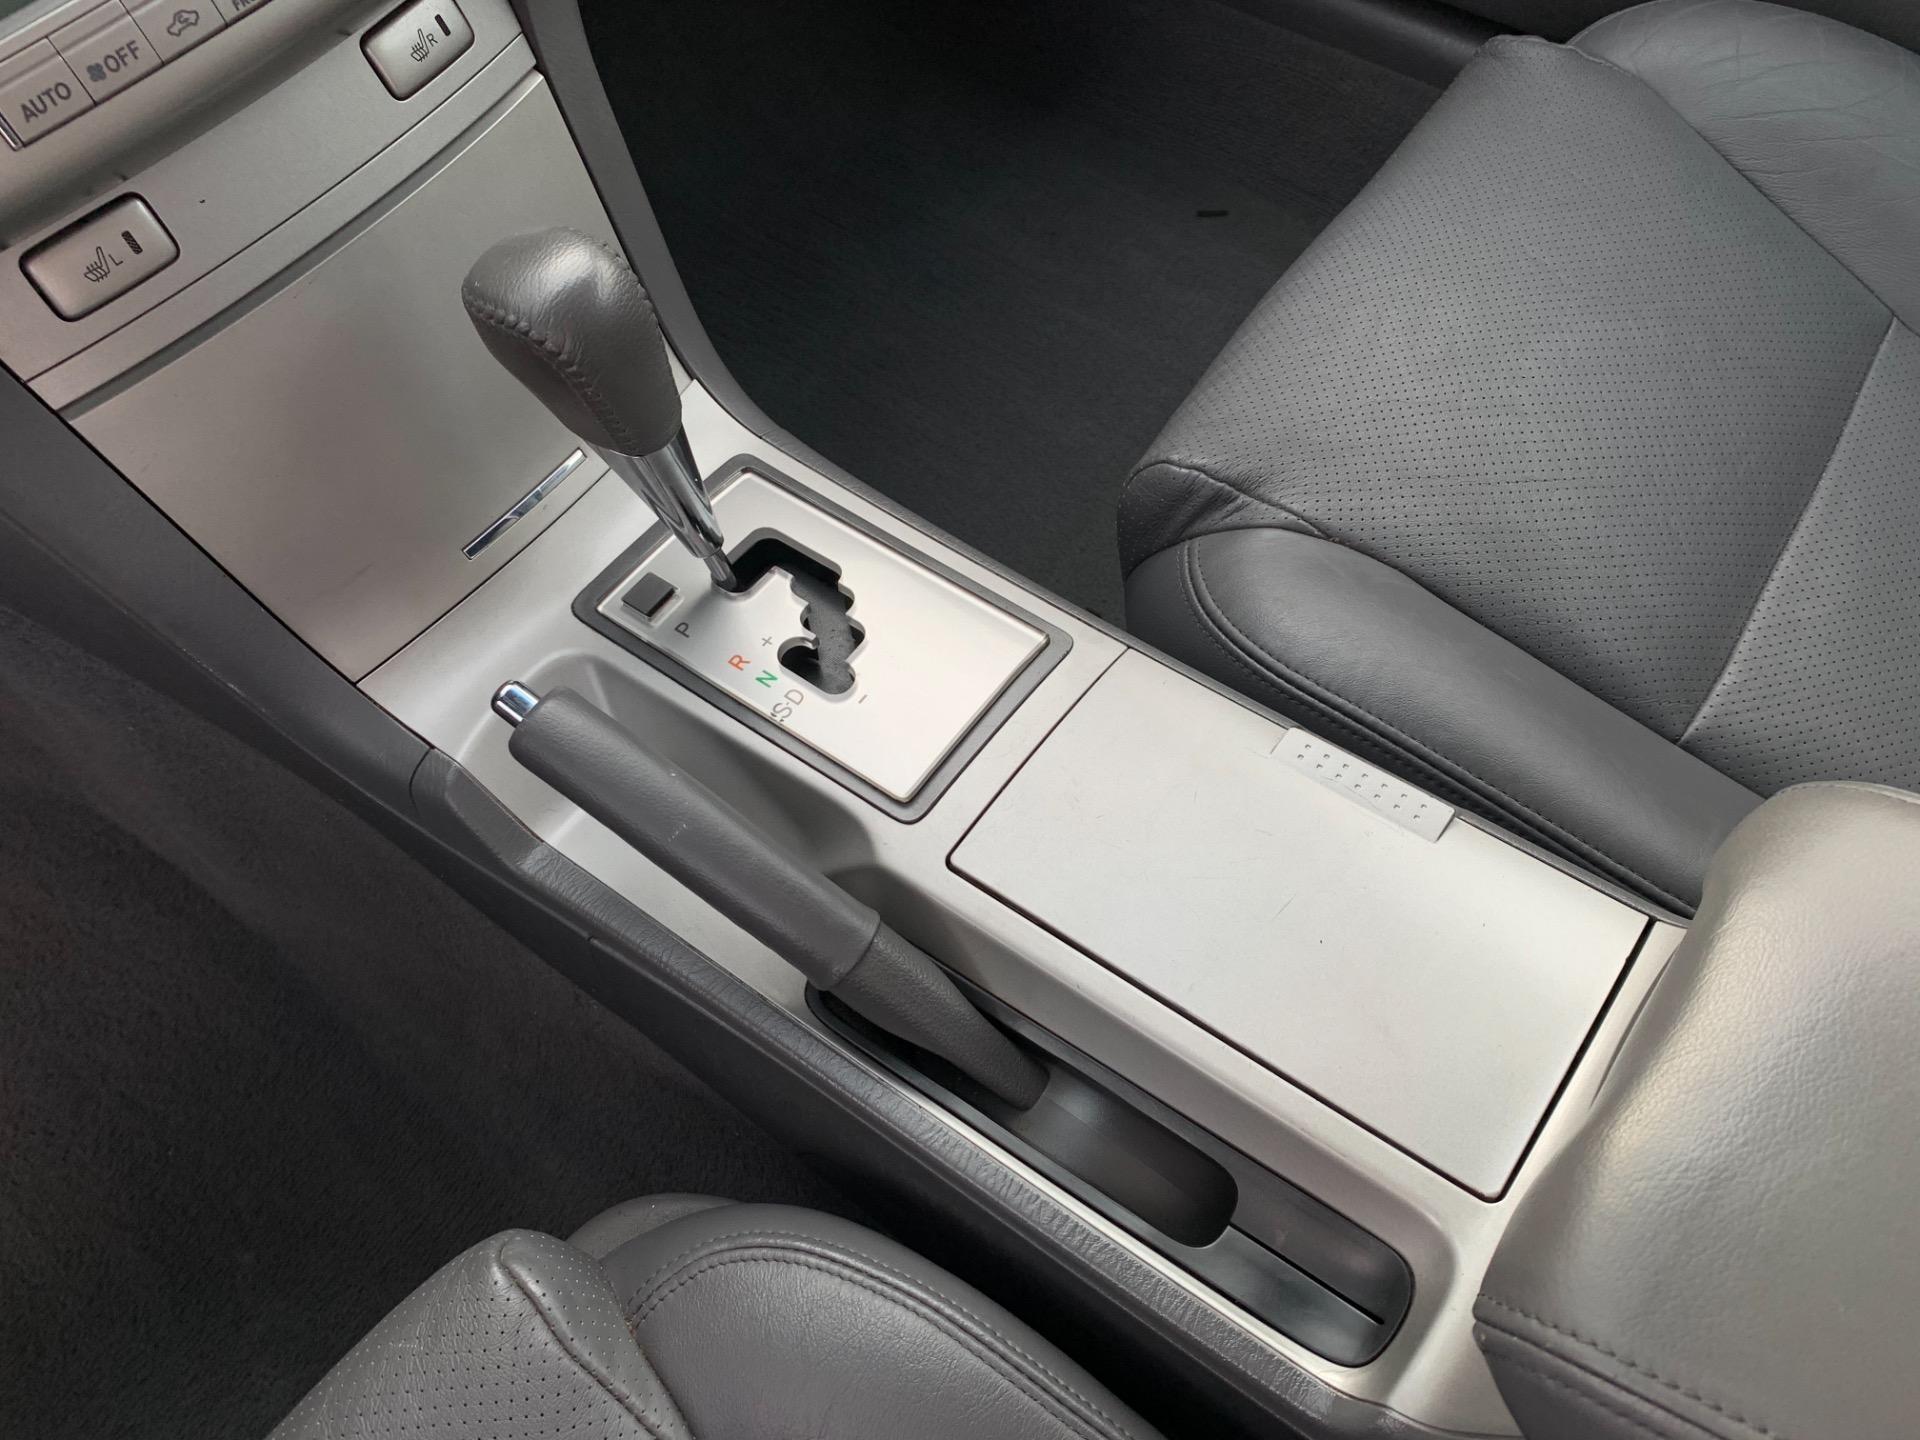 Used-2008-Toyota-Camry-Solara-SLE-V6-Convertible